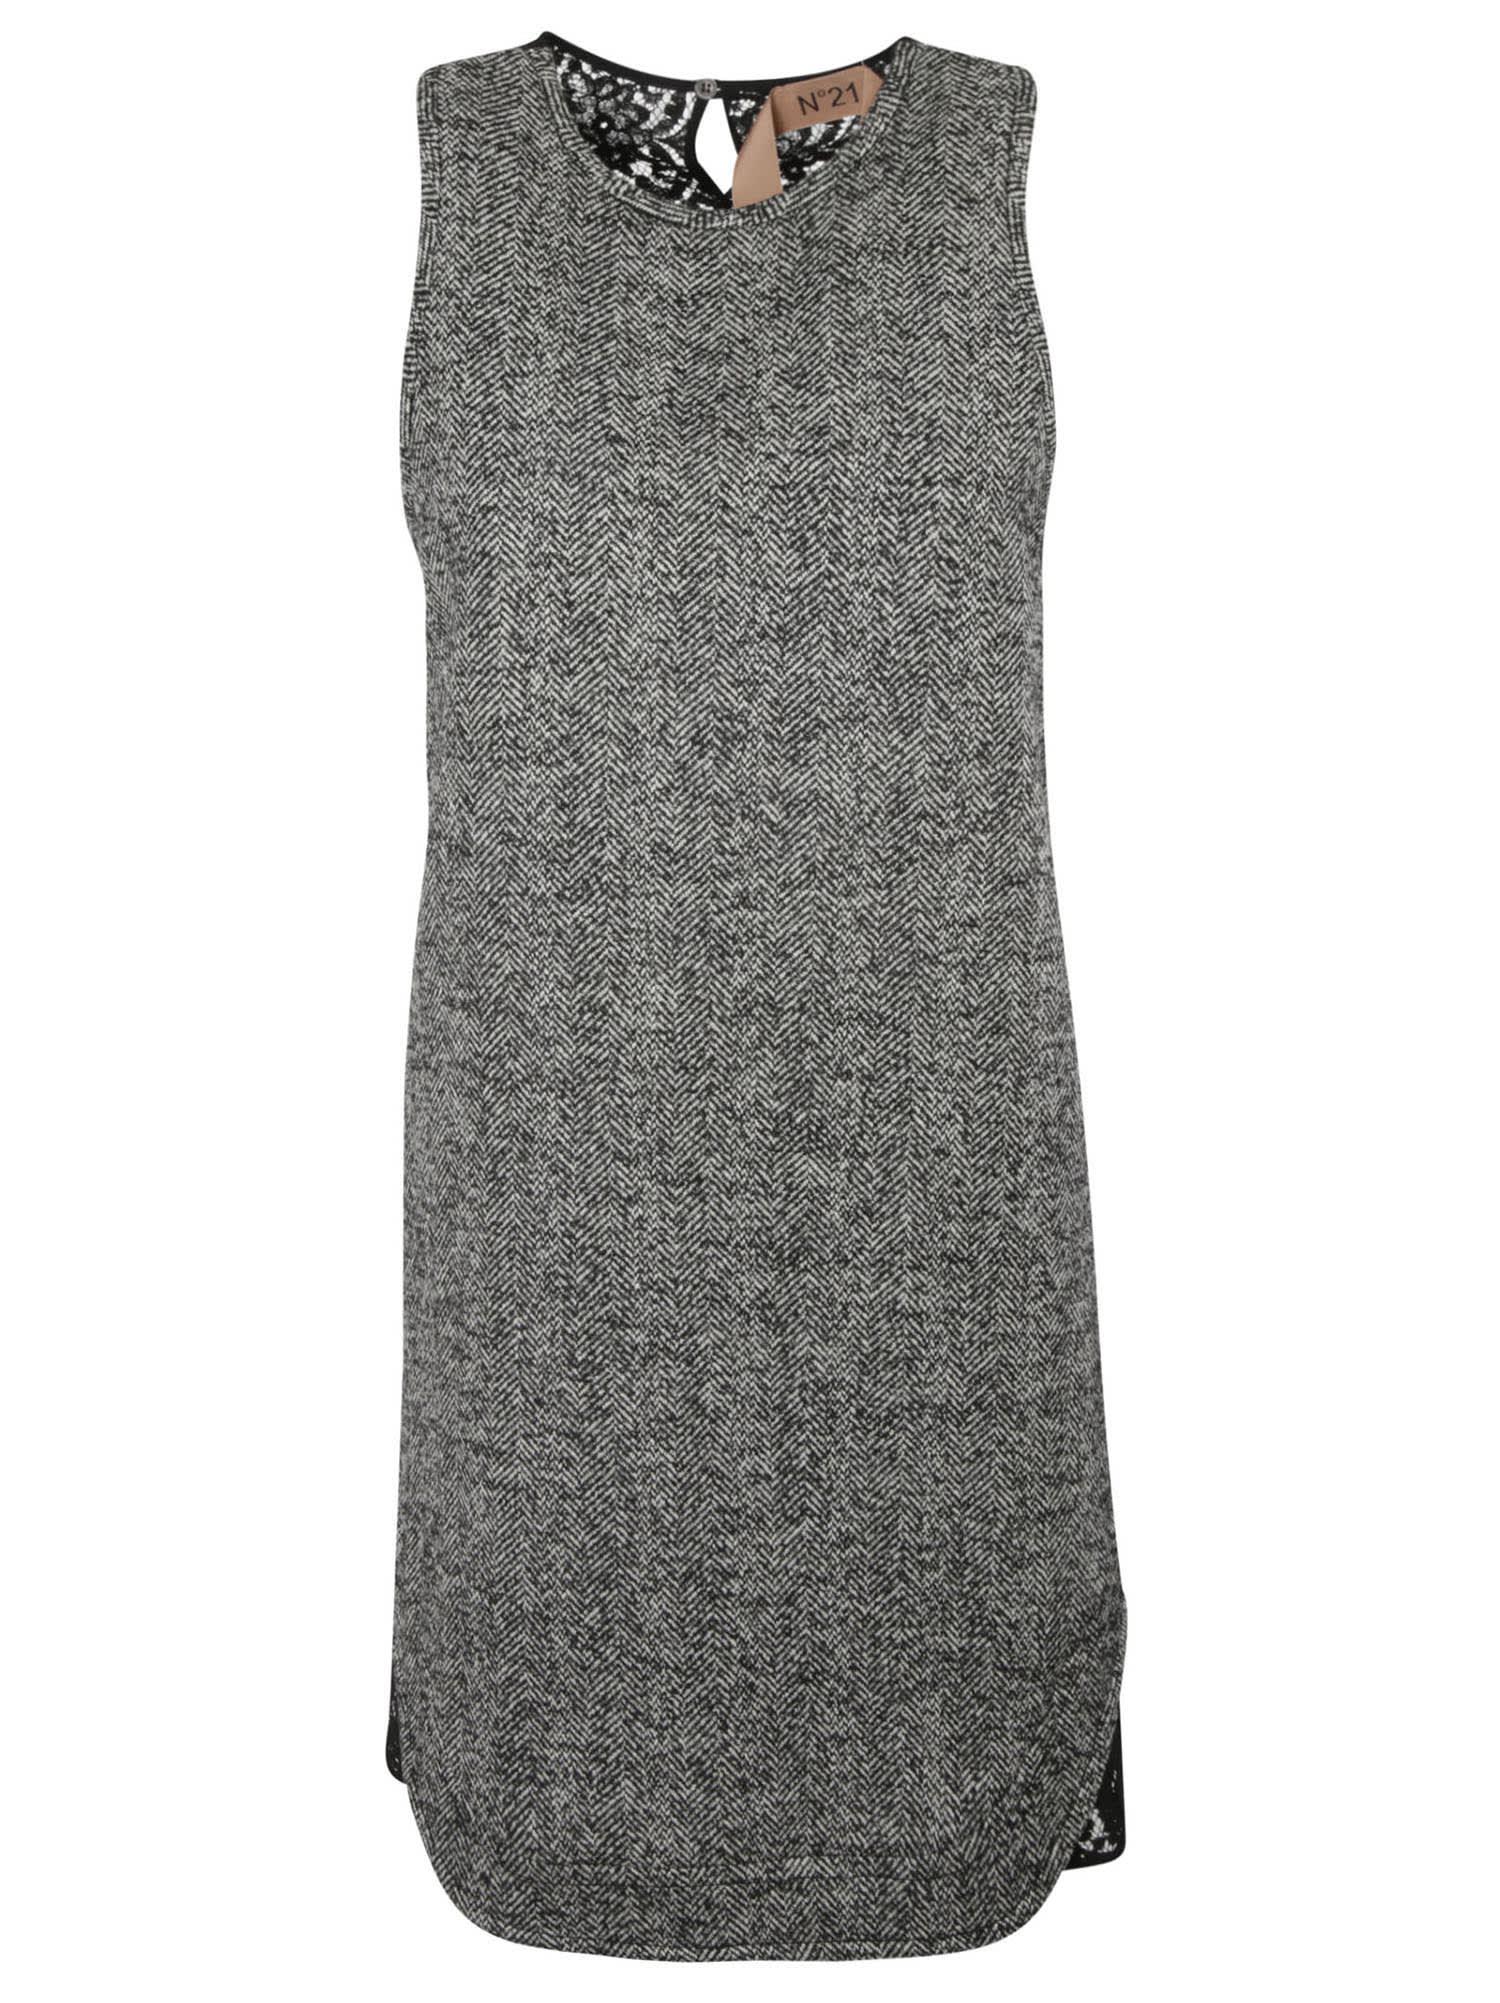 N.21 Woven Dress